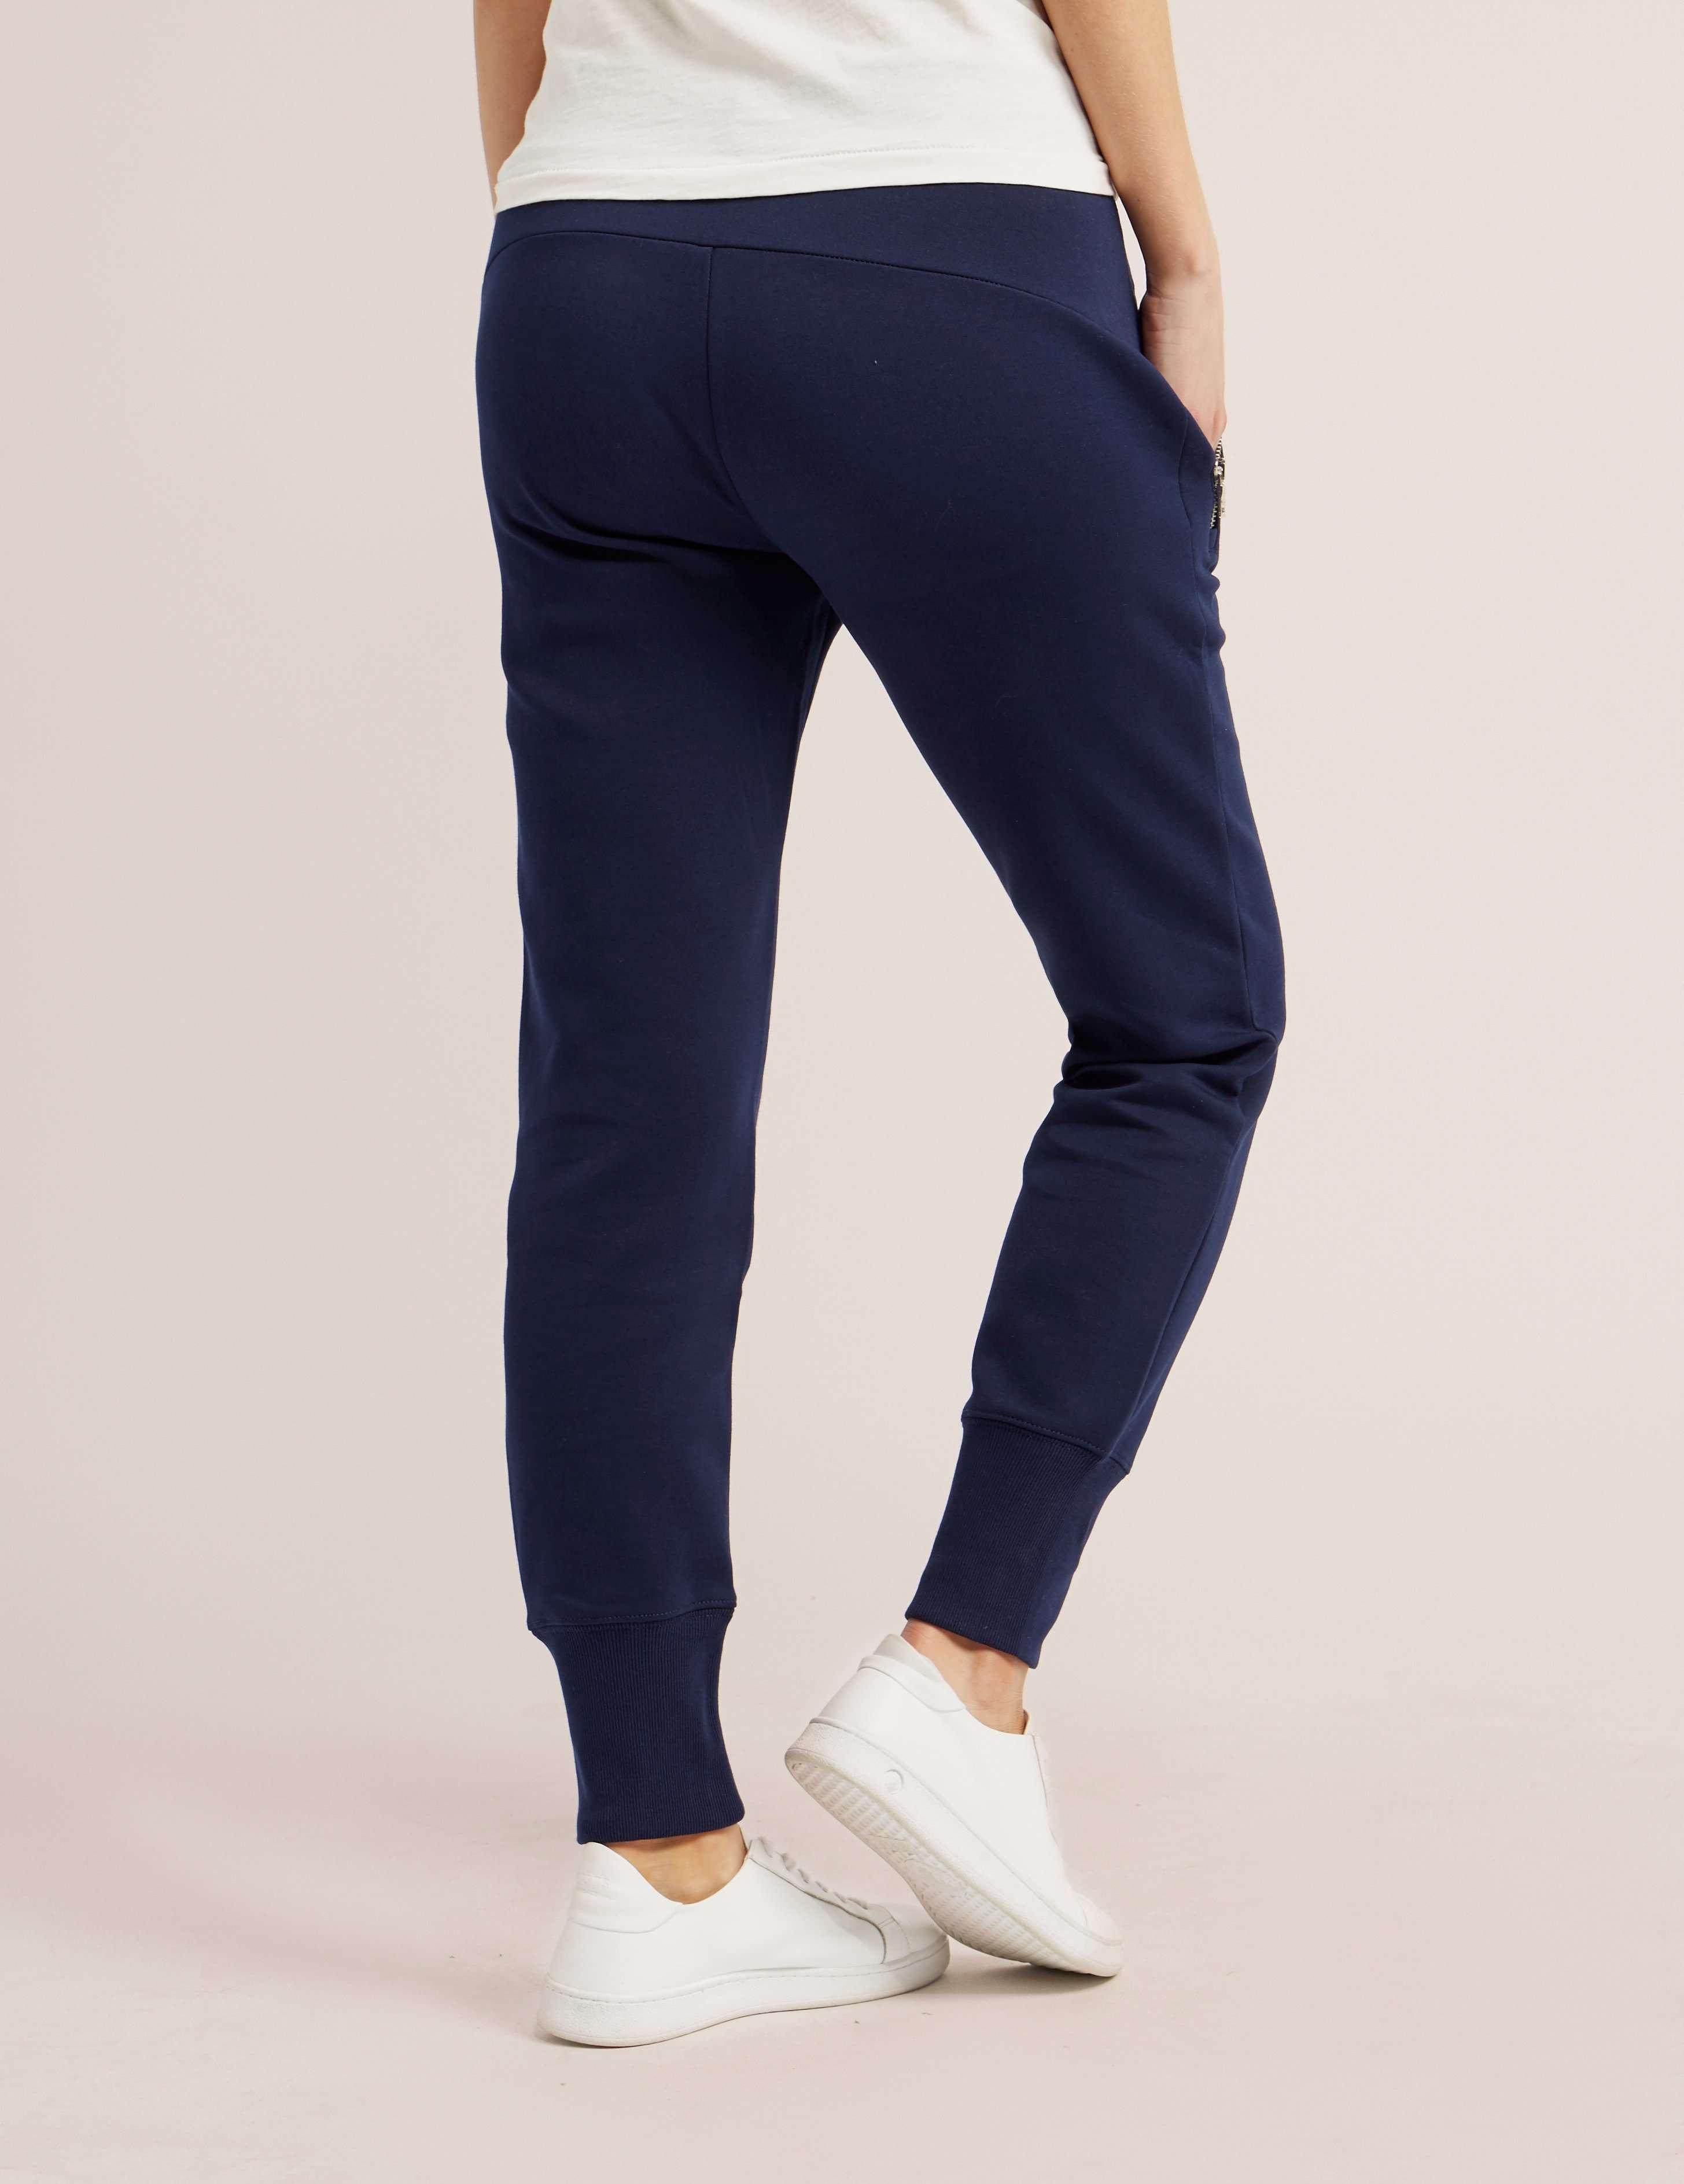 Polo Ralph Lauren Athletic Sweat Pants